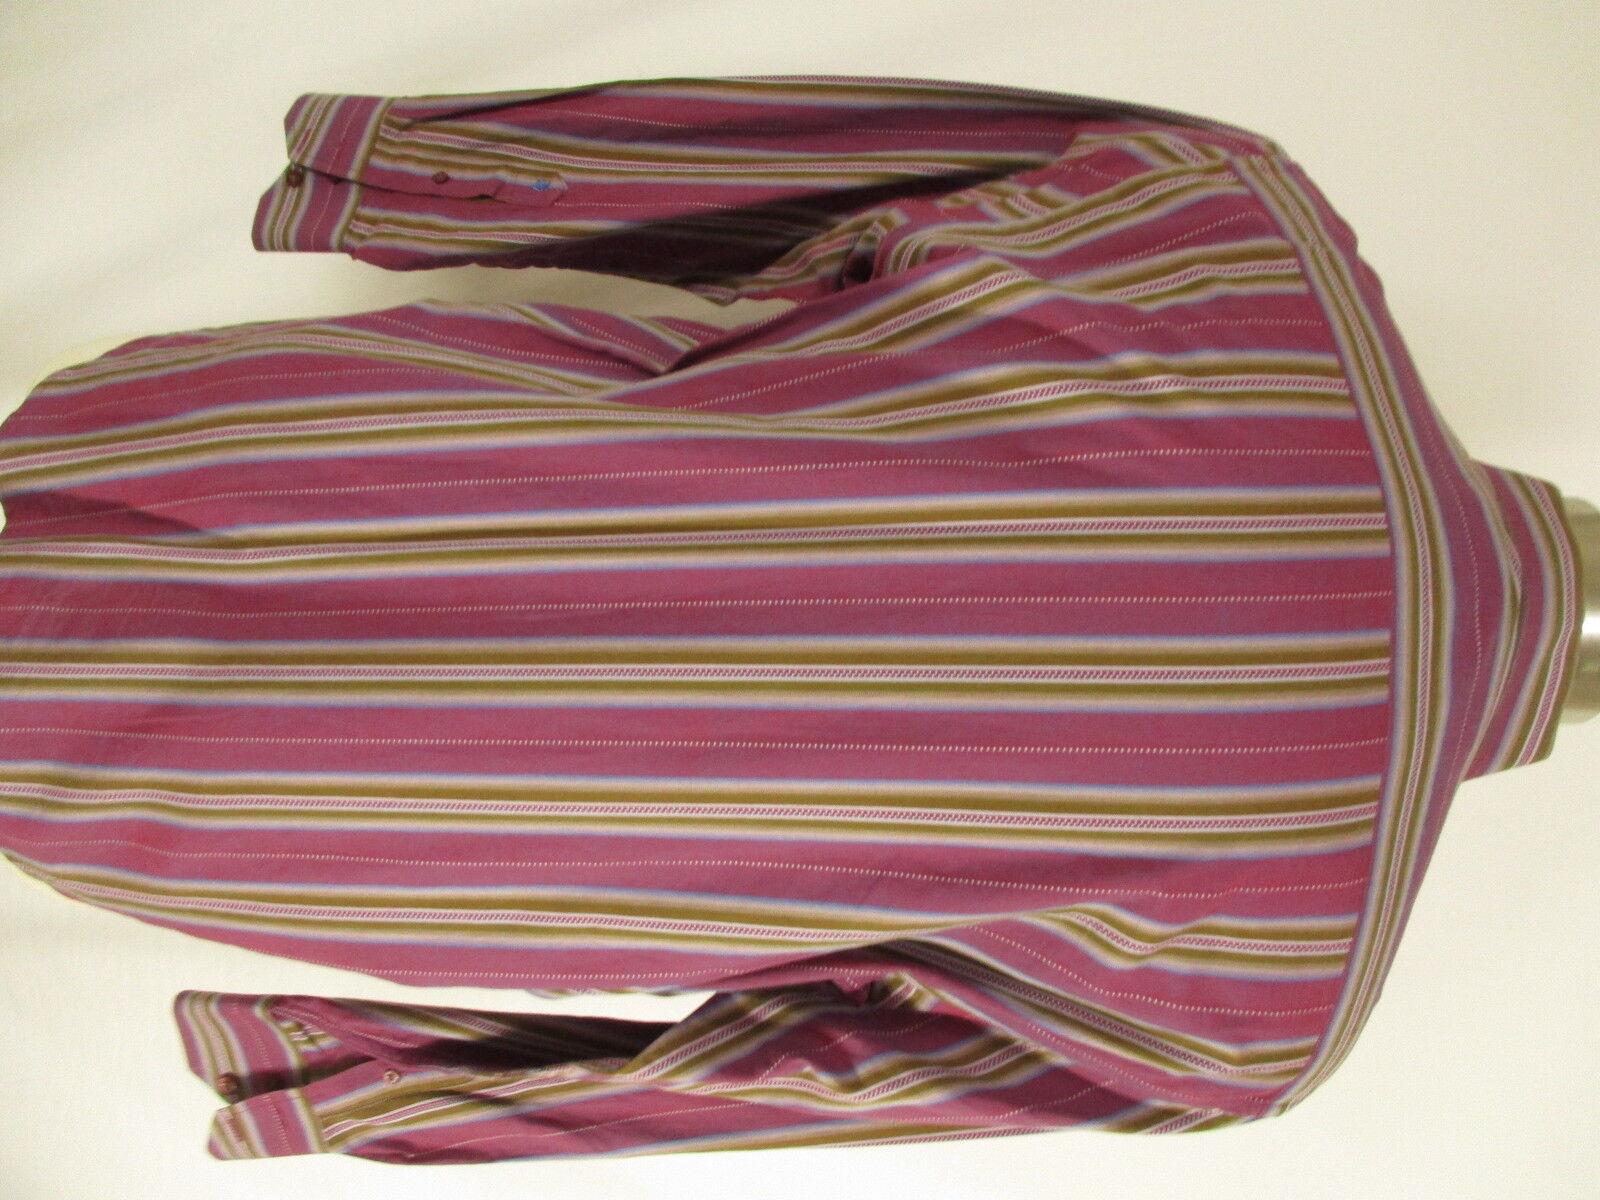 Robert Graham Uomo rosso Stripe Stripe Stripe Flip Cuff Shirt L 9e43b9